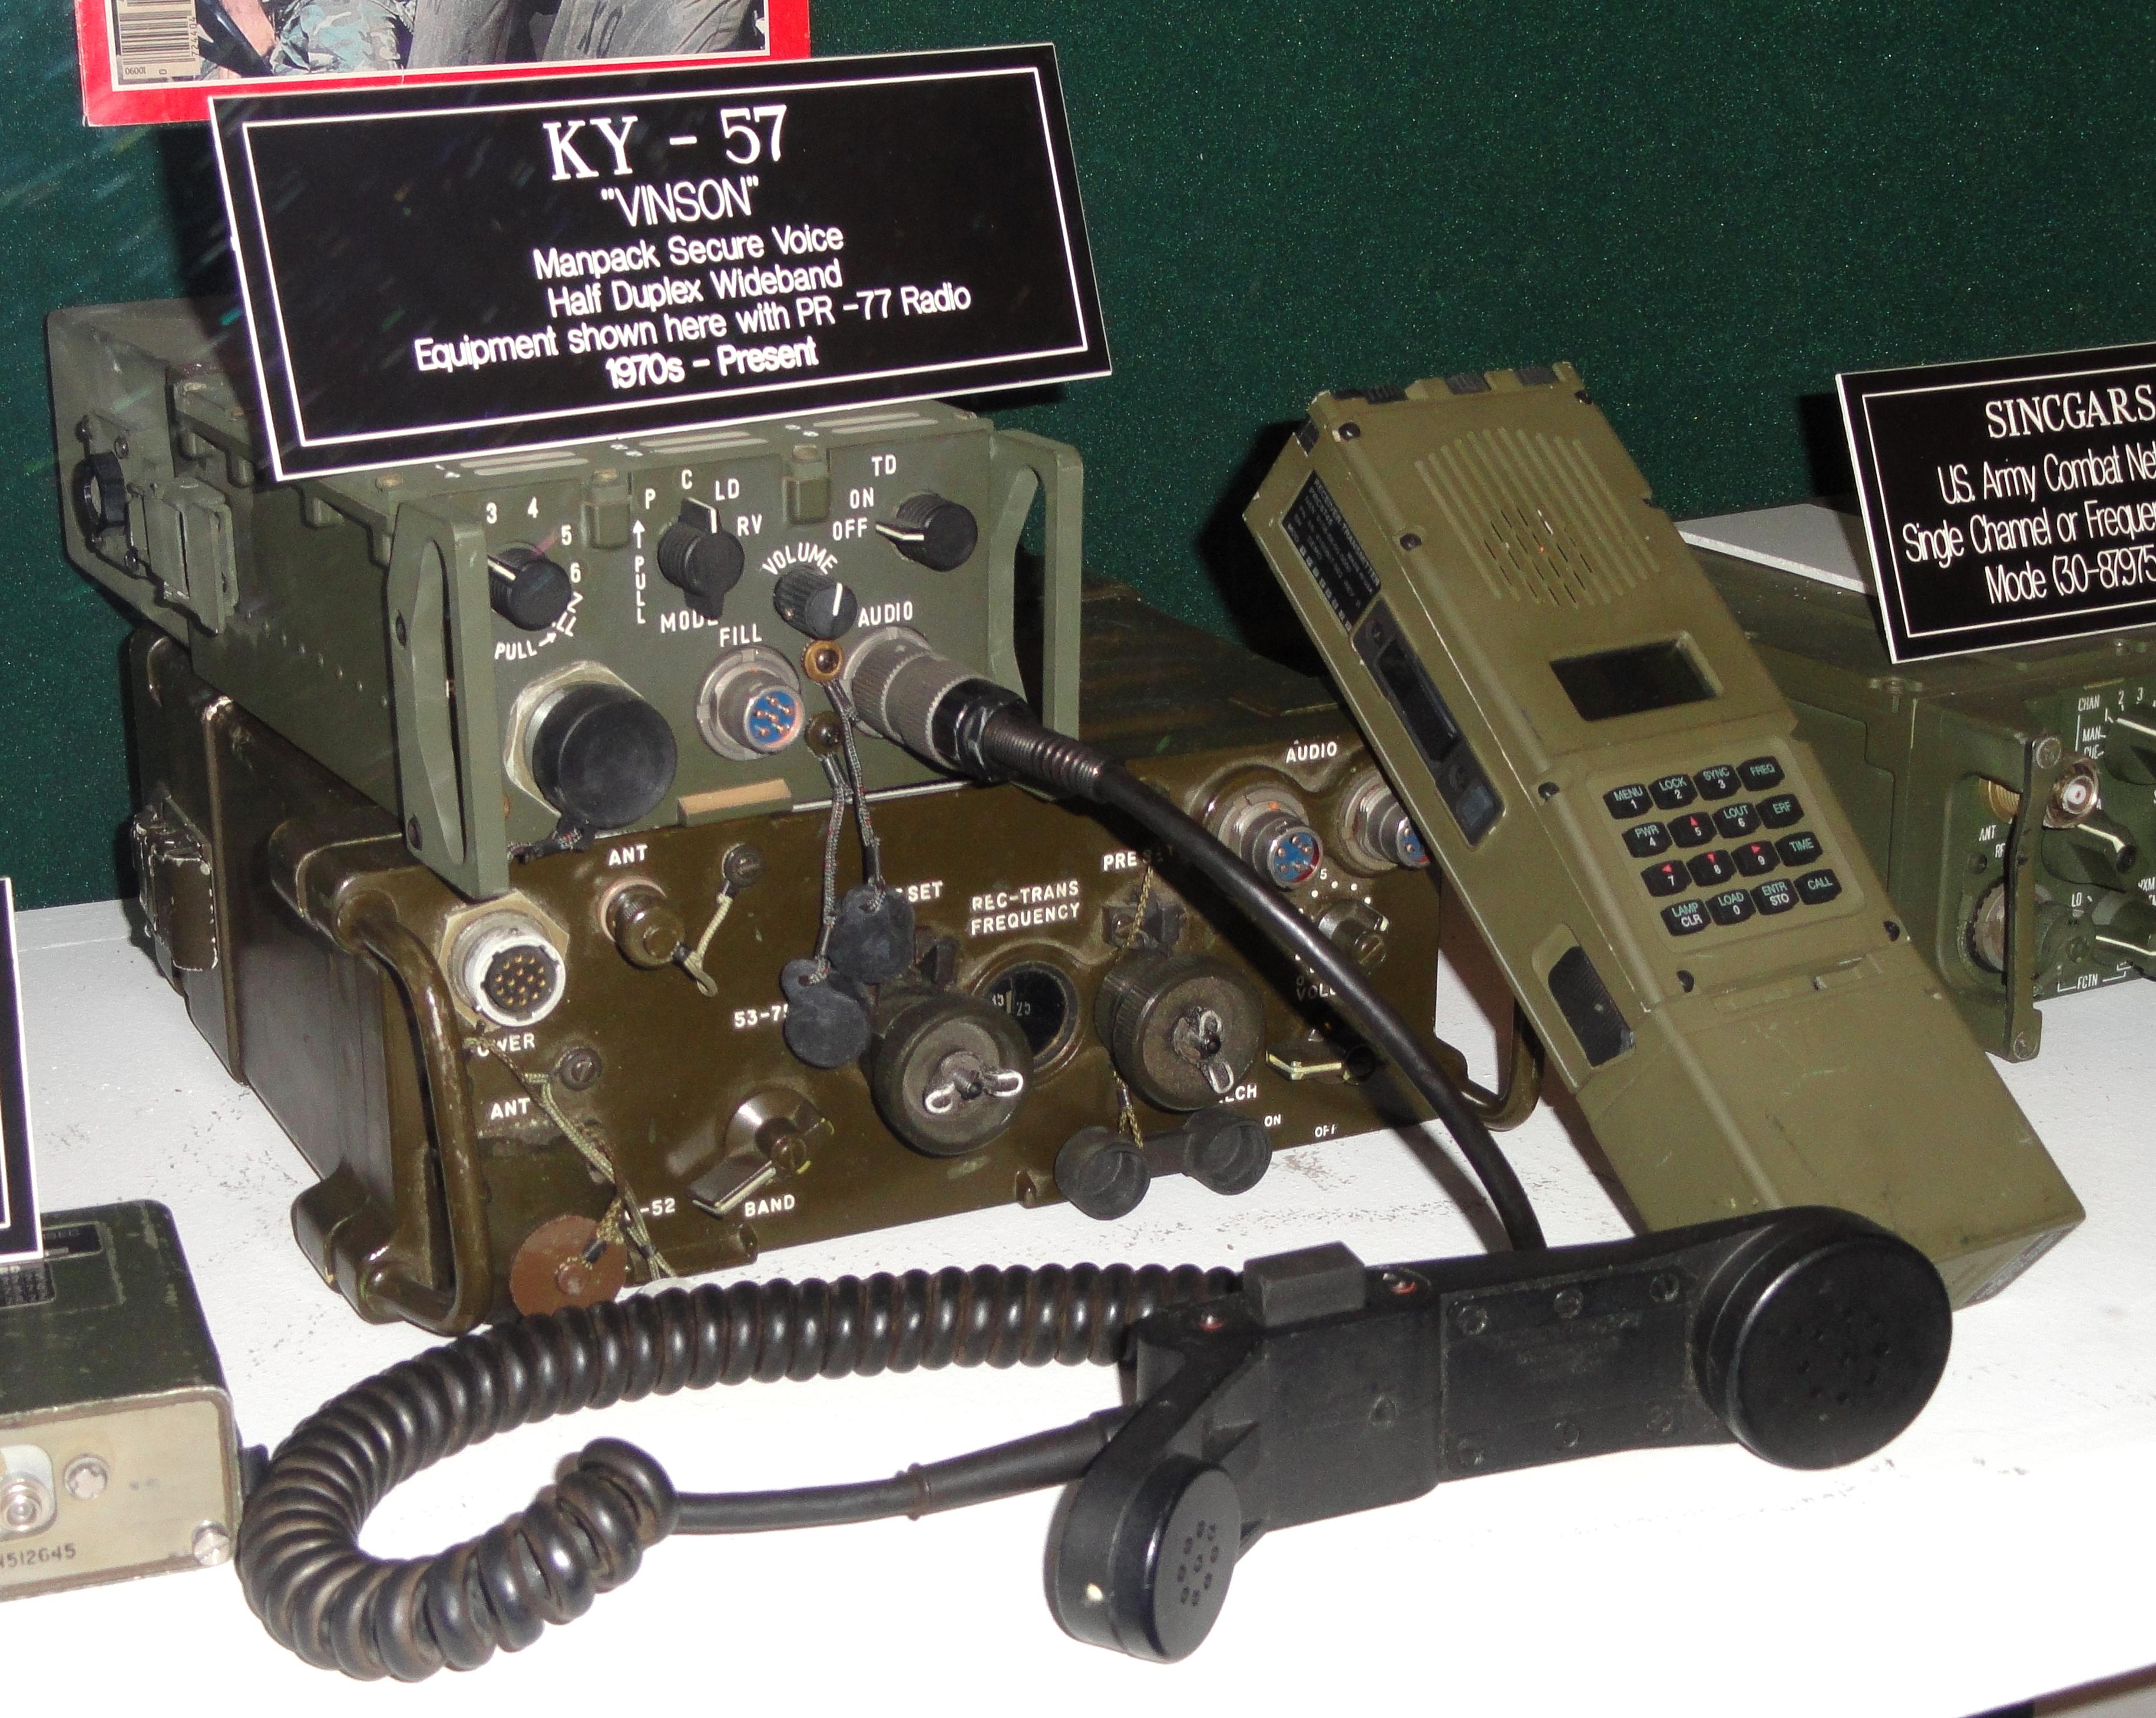 File:KY-57 VINSON manpack with PR-77 radio - National